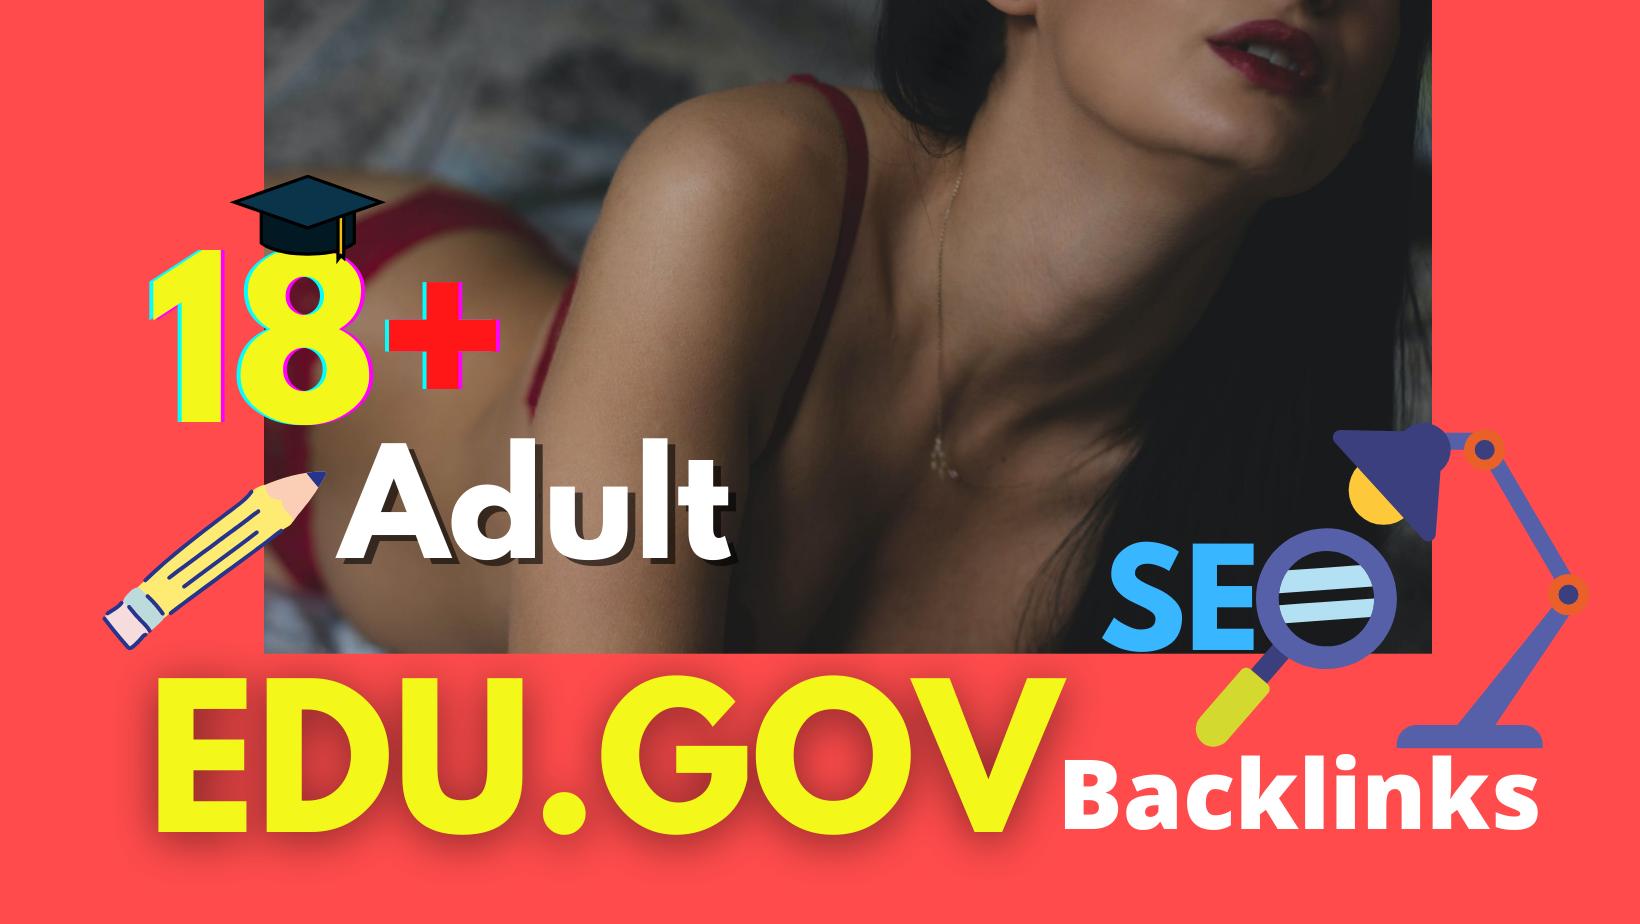 I will manually 100 EDU.GOV backlinks highDA-PA google Top ranking for your adult websites